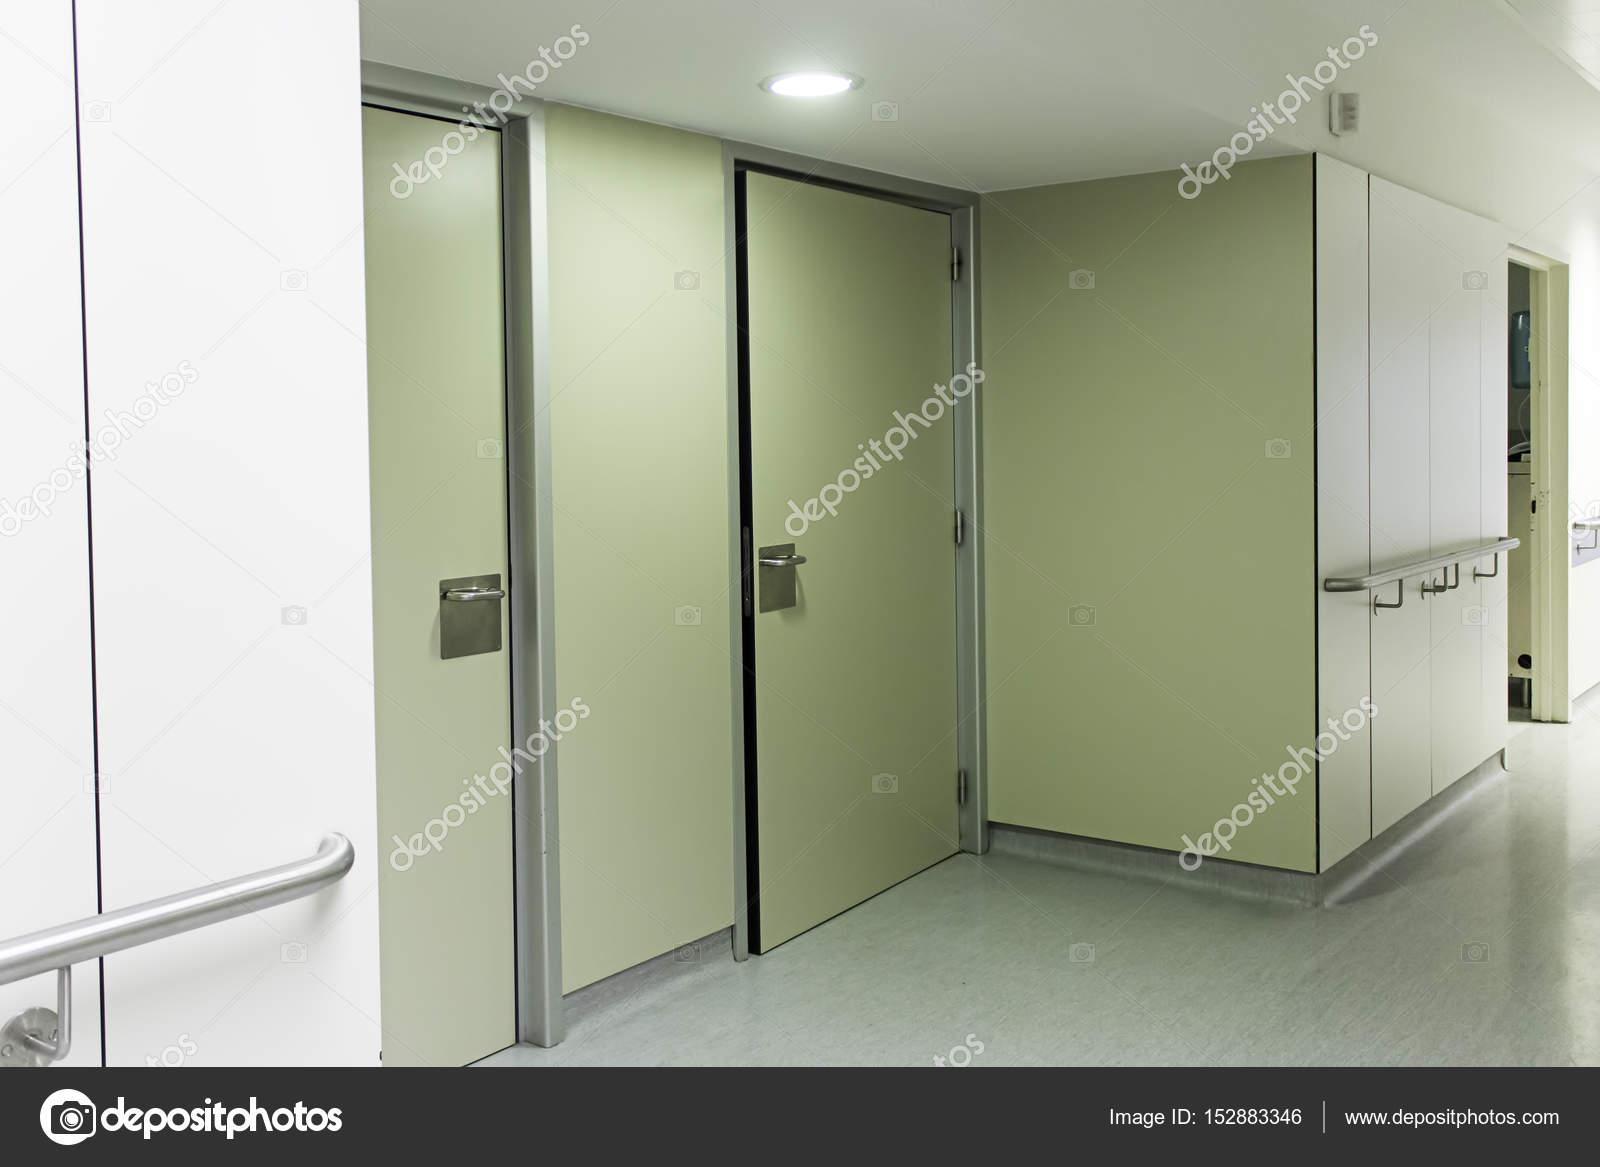 https://st3.depositphotos.com/1730367/15288/i/1600/depositphotos_152883346-stockafbeelding-interieur-gang-ziekenhuis.jpg